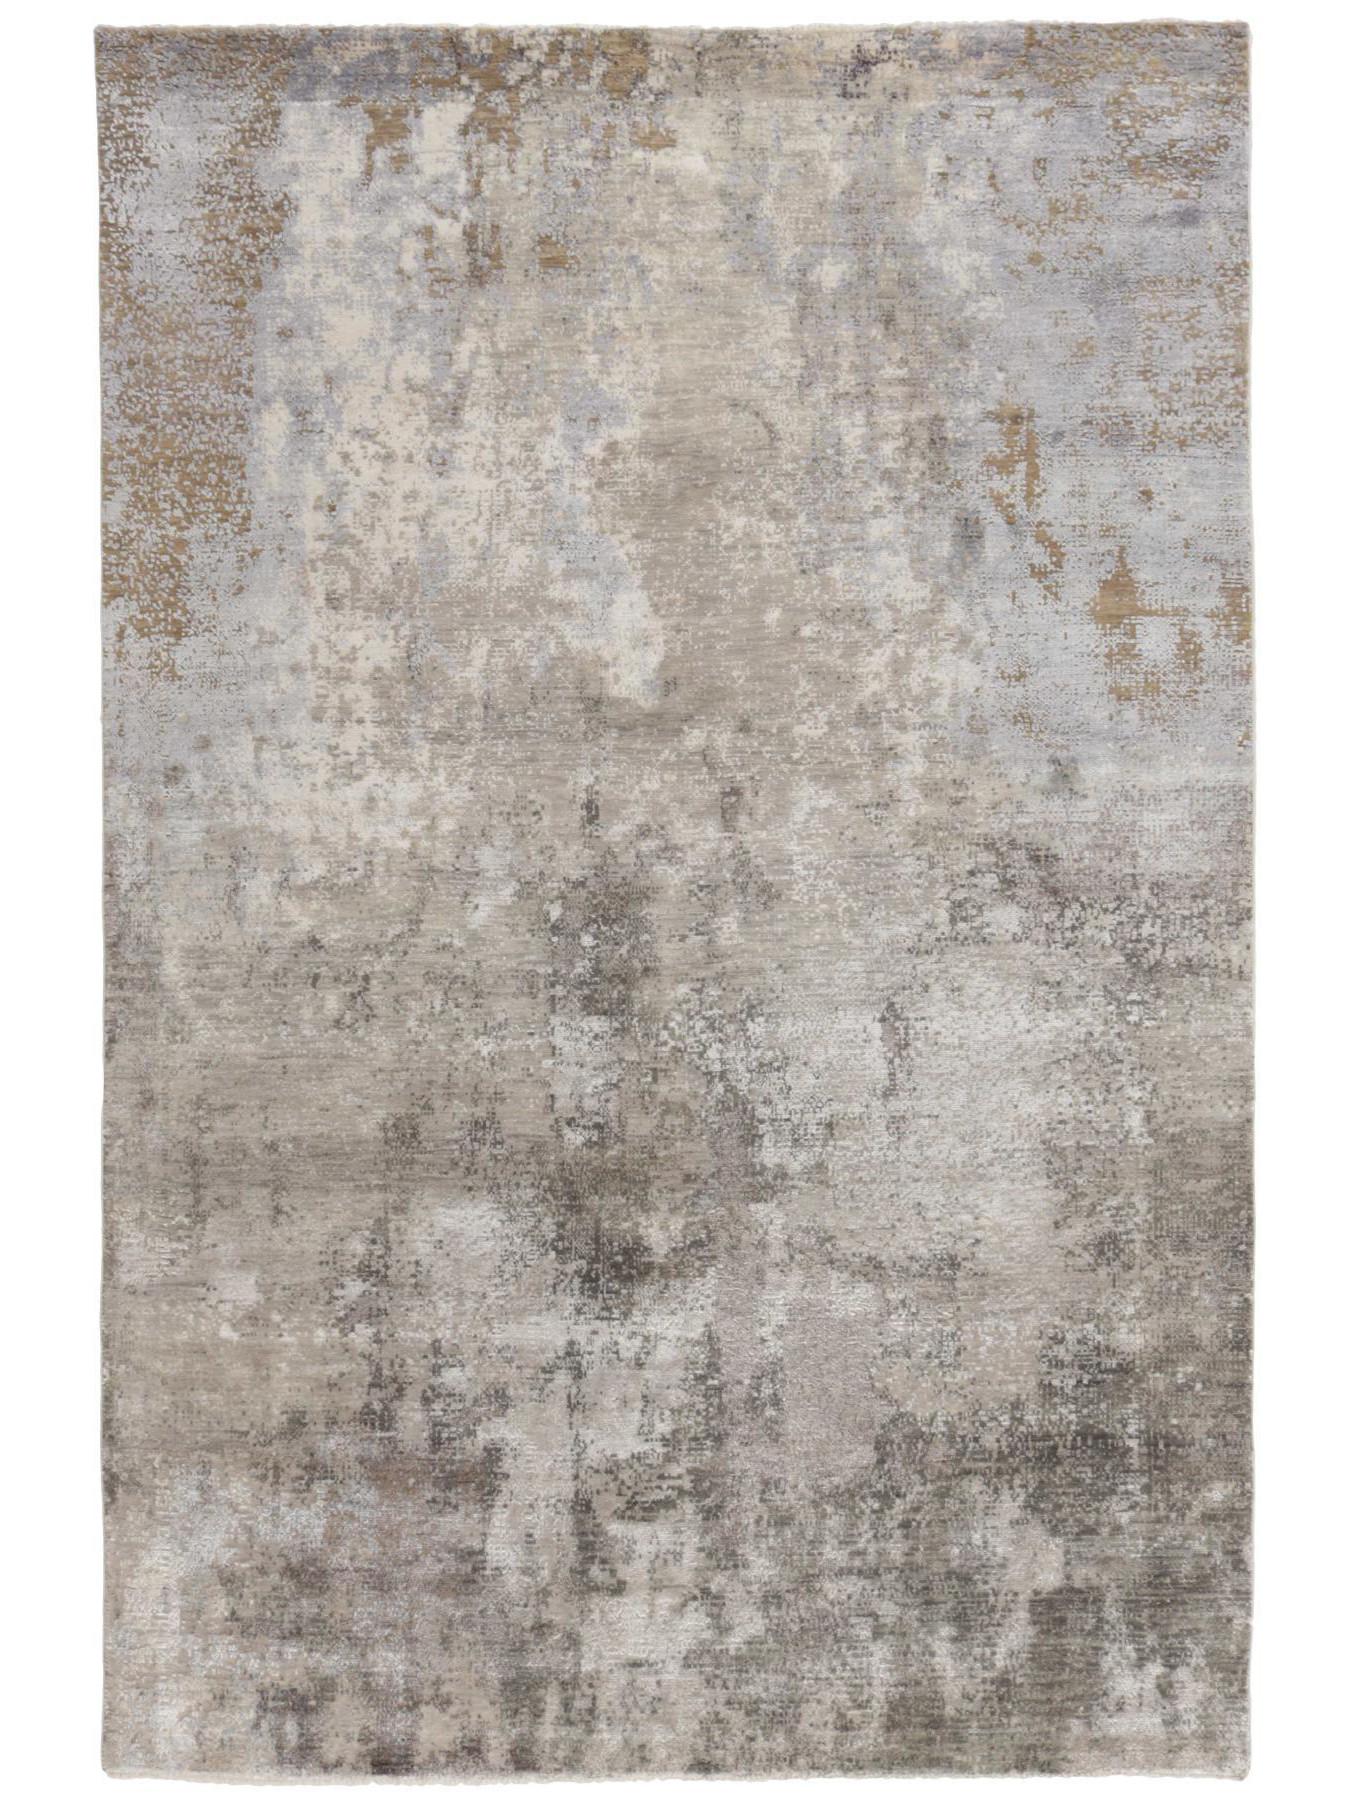 Design carpets - Seduction-840162B